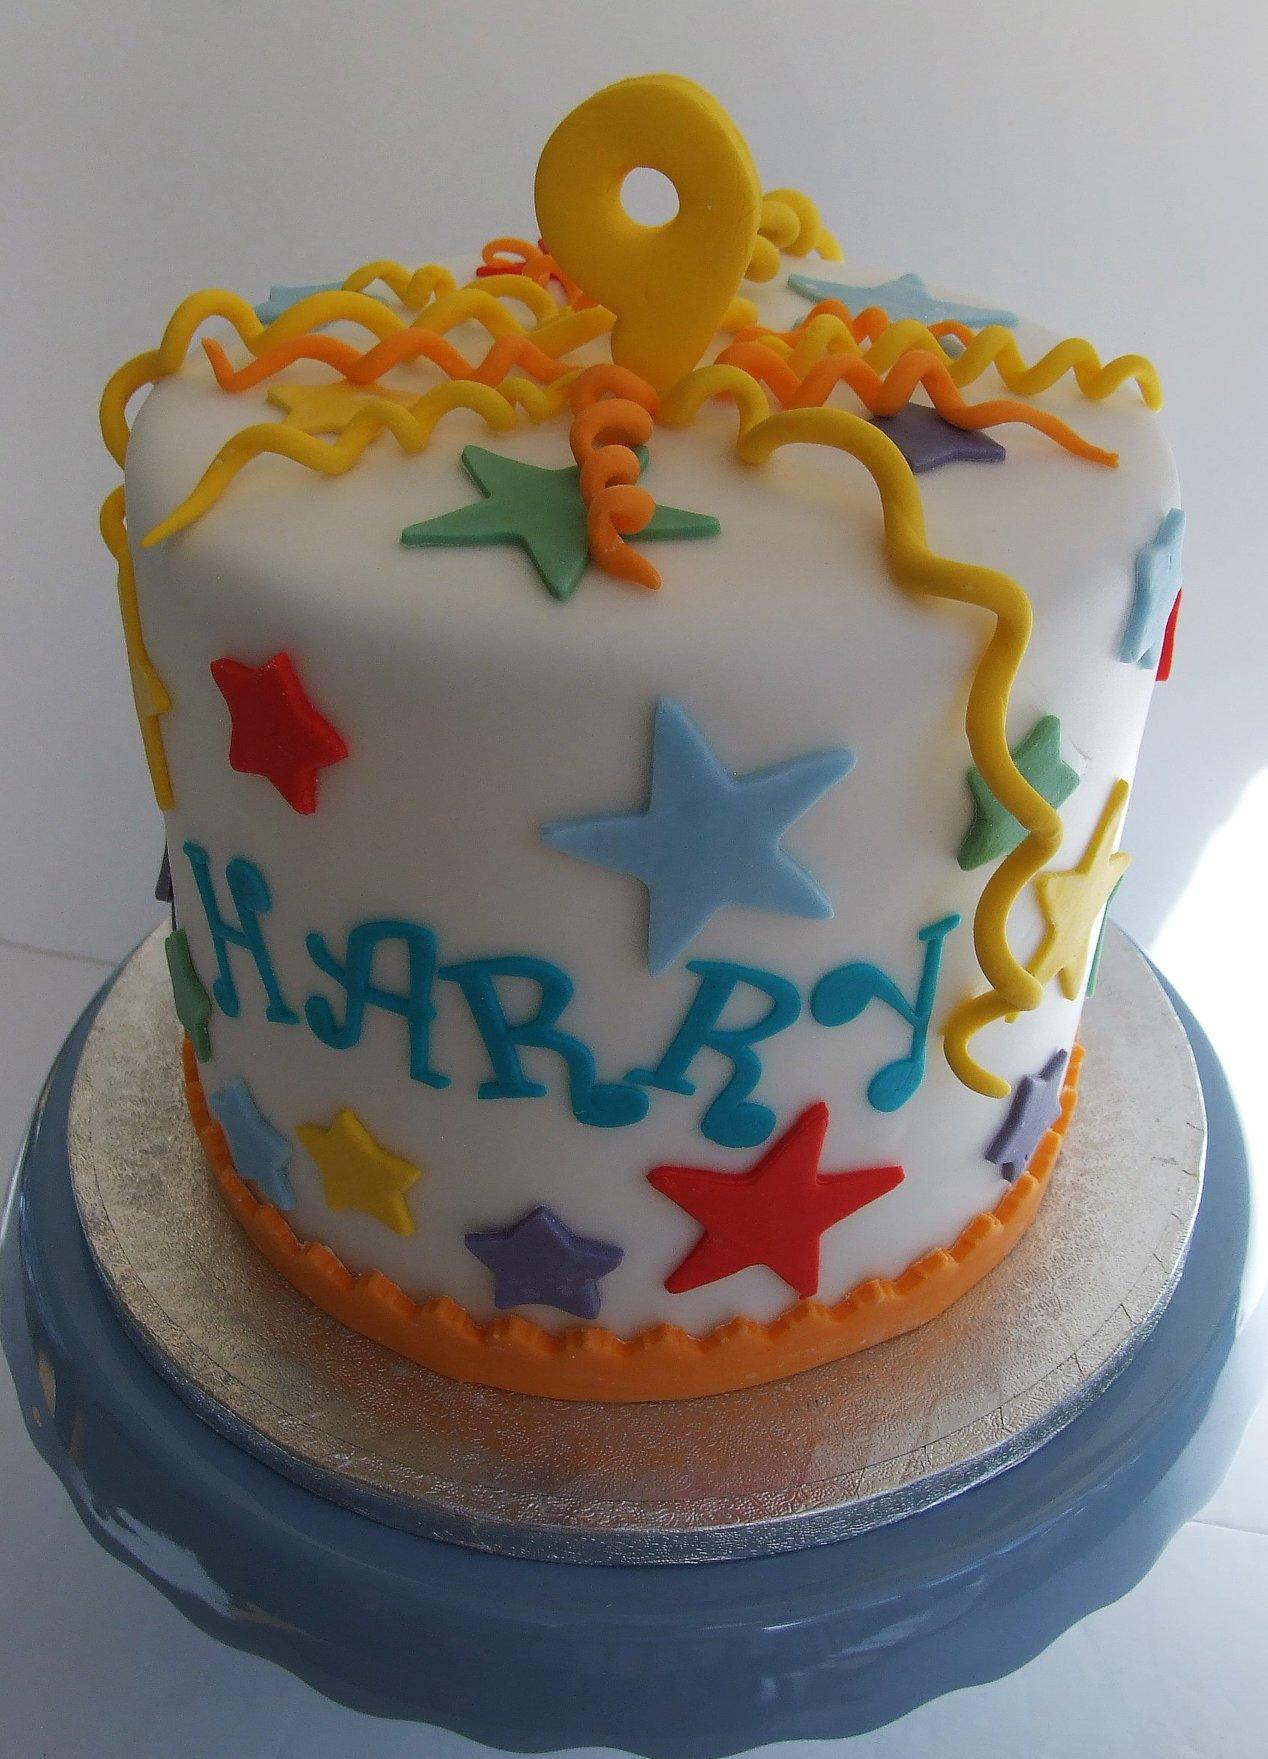 Traditional Birthday Cake Royal Icing Simply Delish